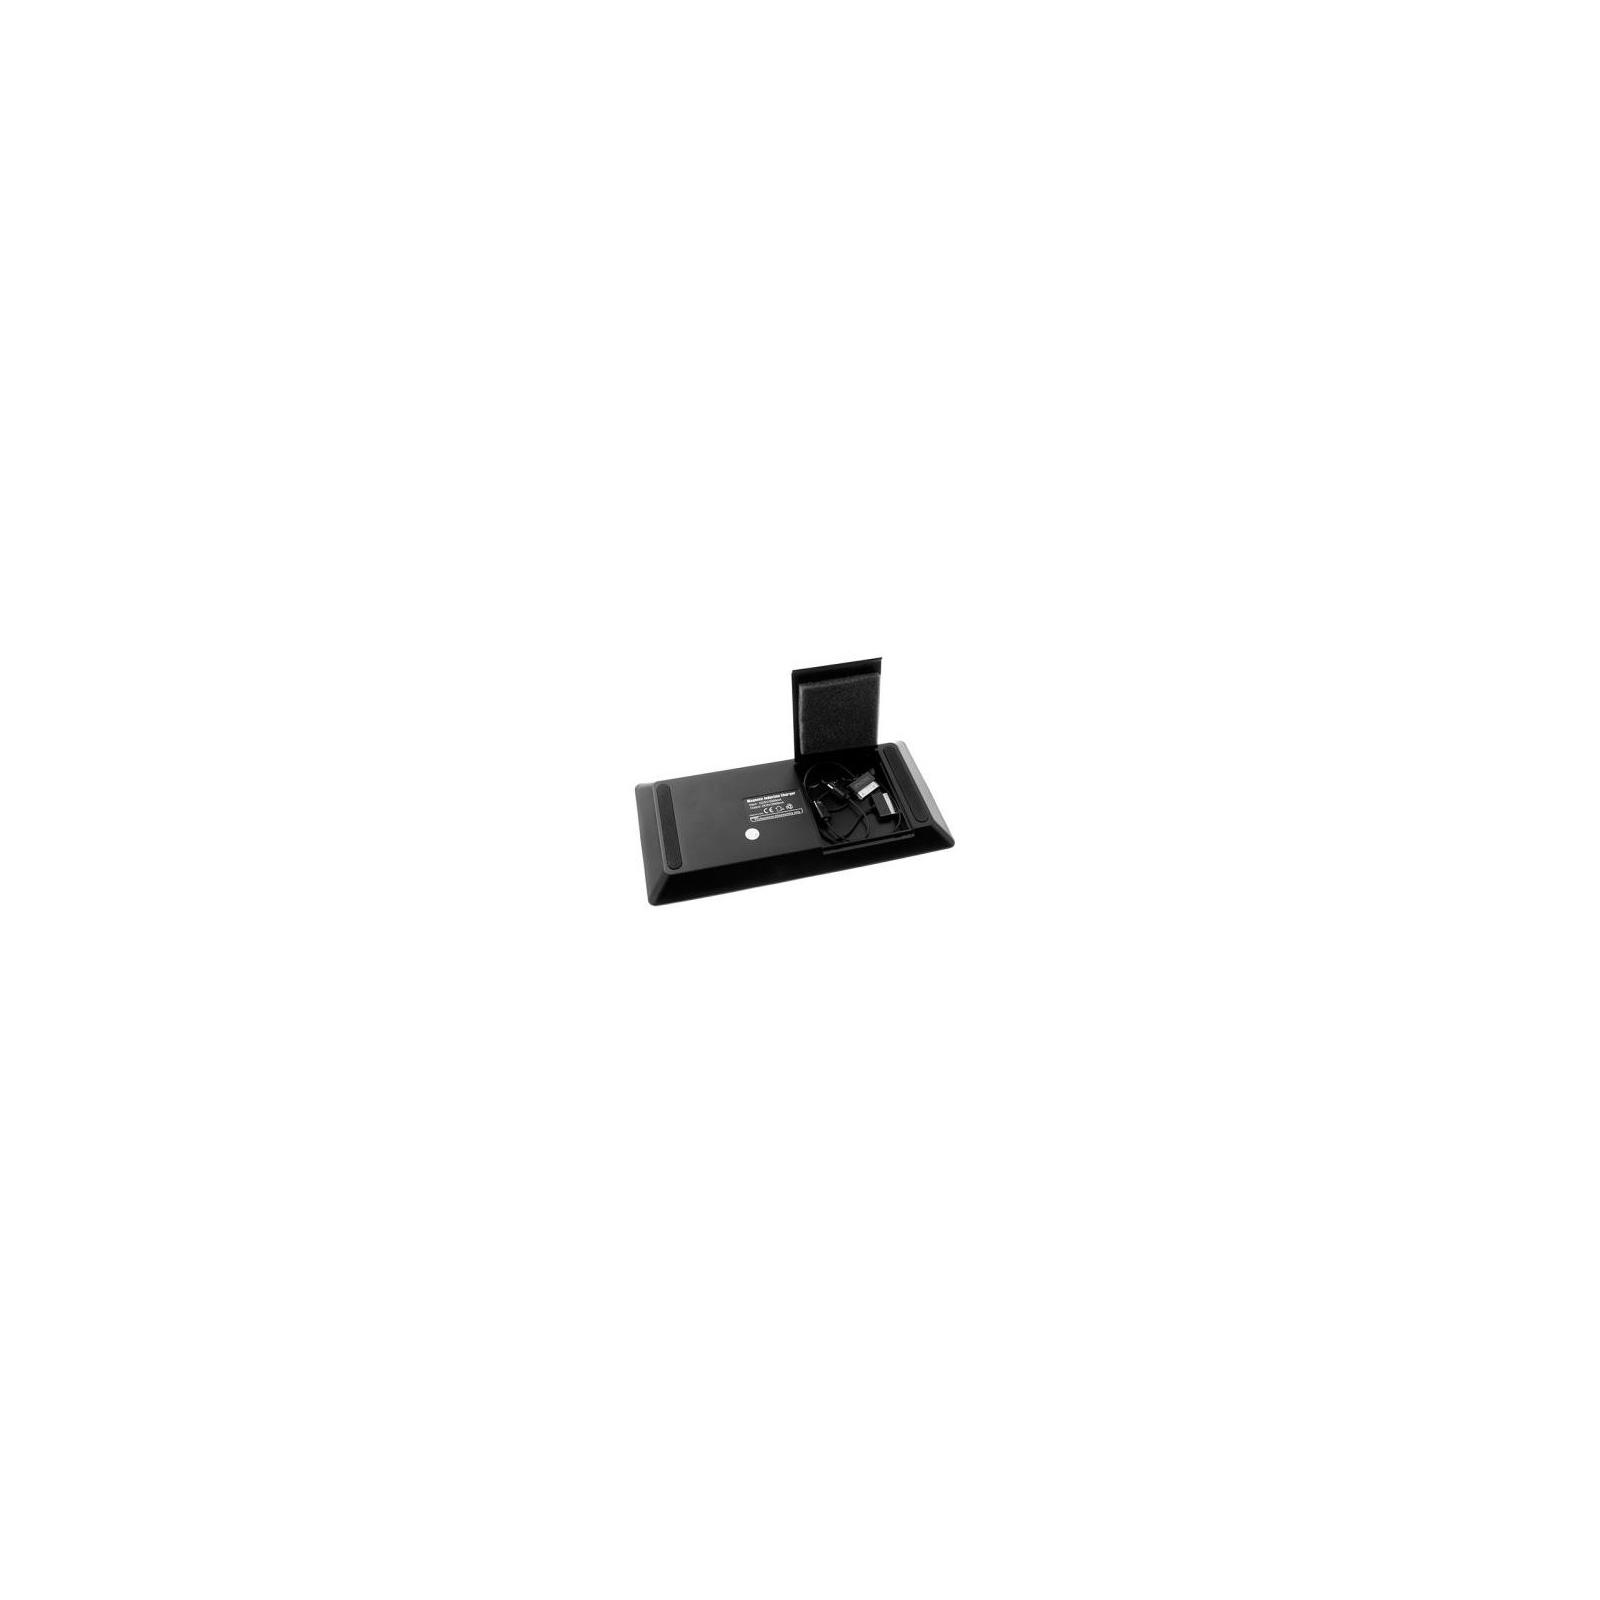 Зарядное устройство Drobak Magnetic Induction Charger (902604)